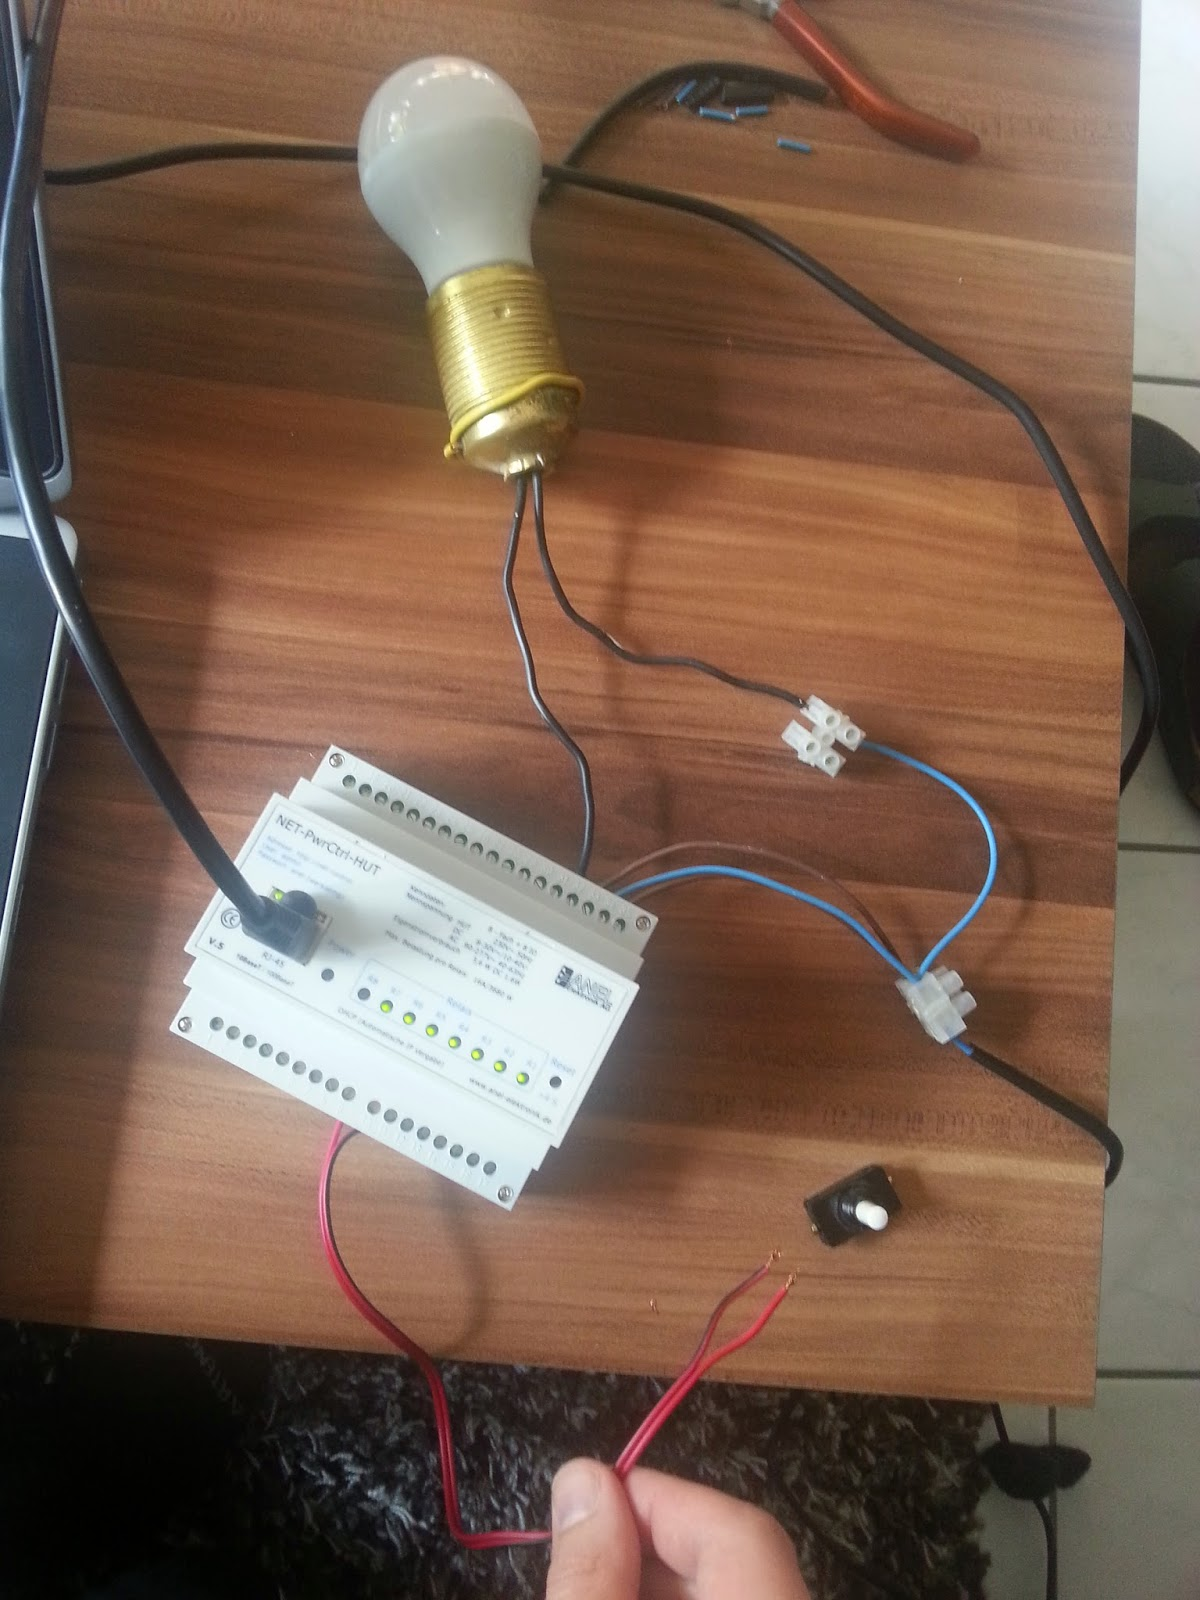 paphko: Heimautomatisierung: DIY